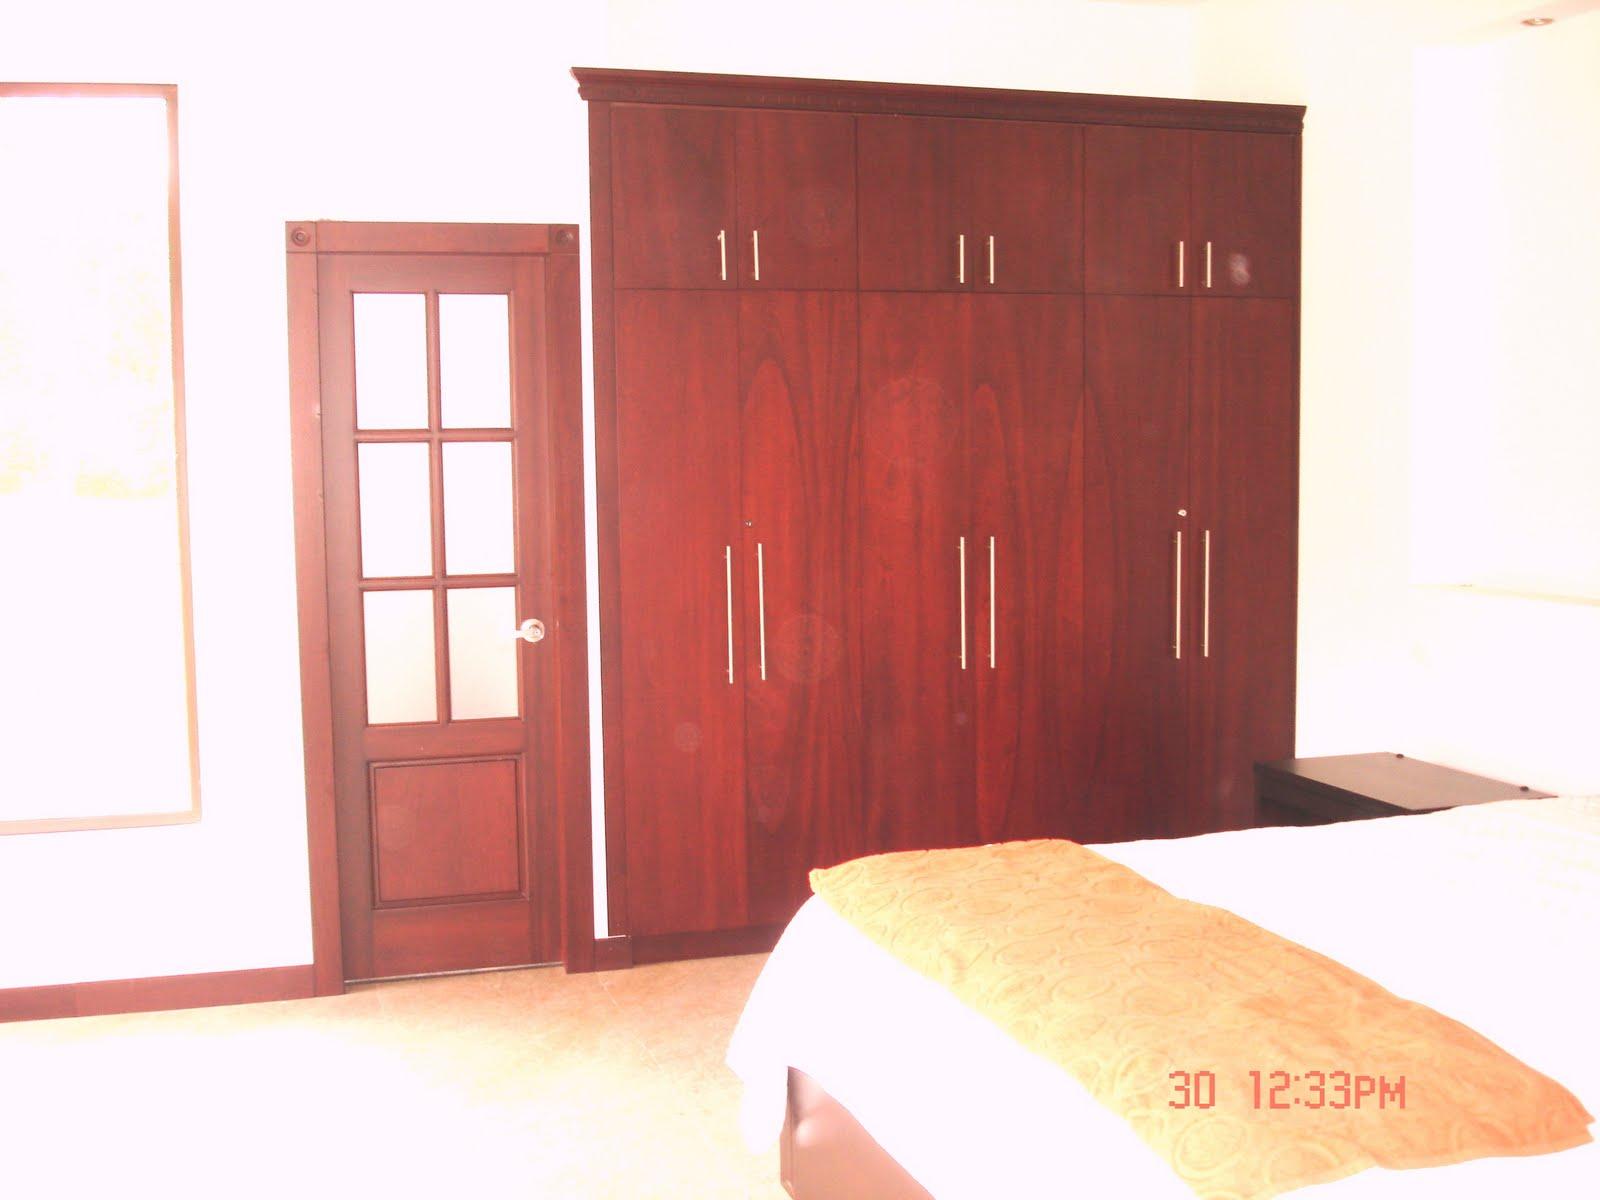 Ideatumobiliario dormitorios closets for Closet modernos para habitaciones